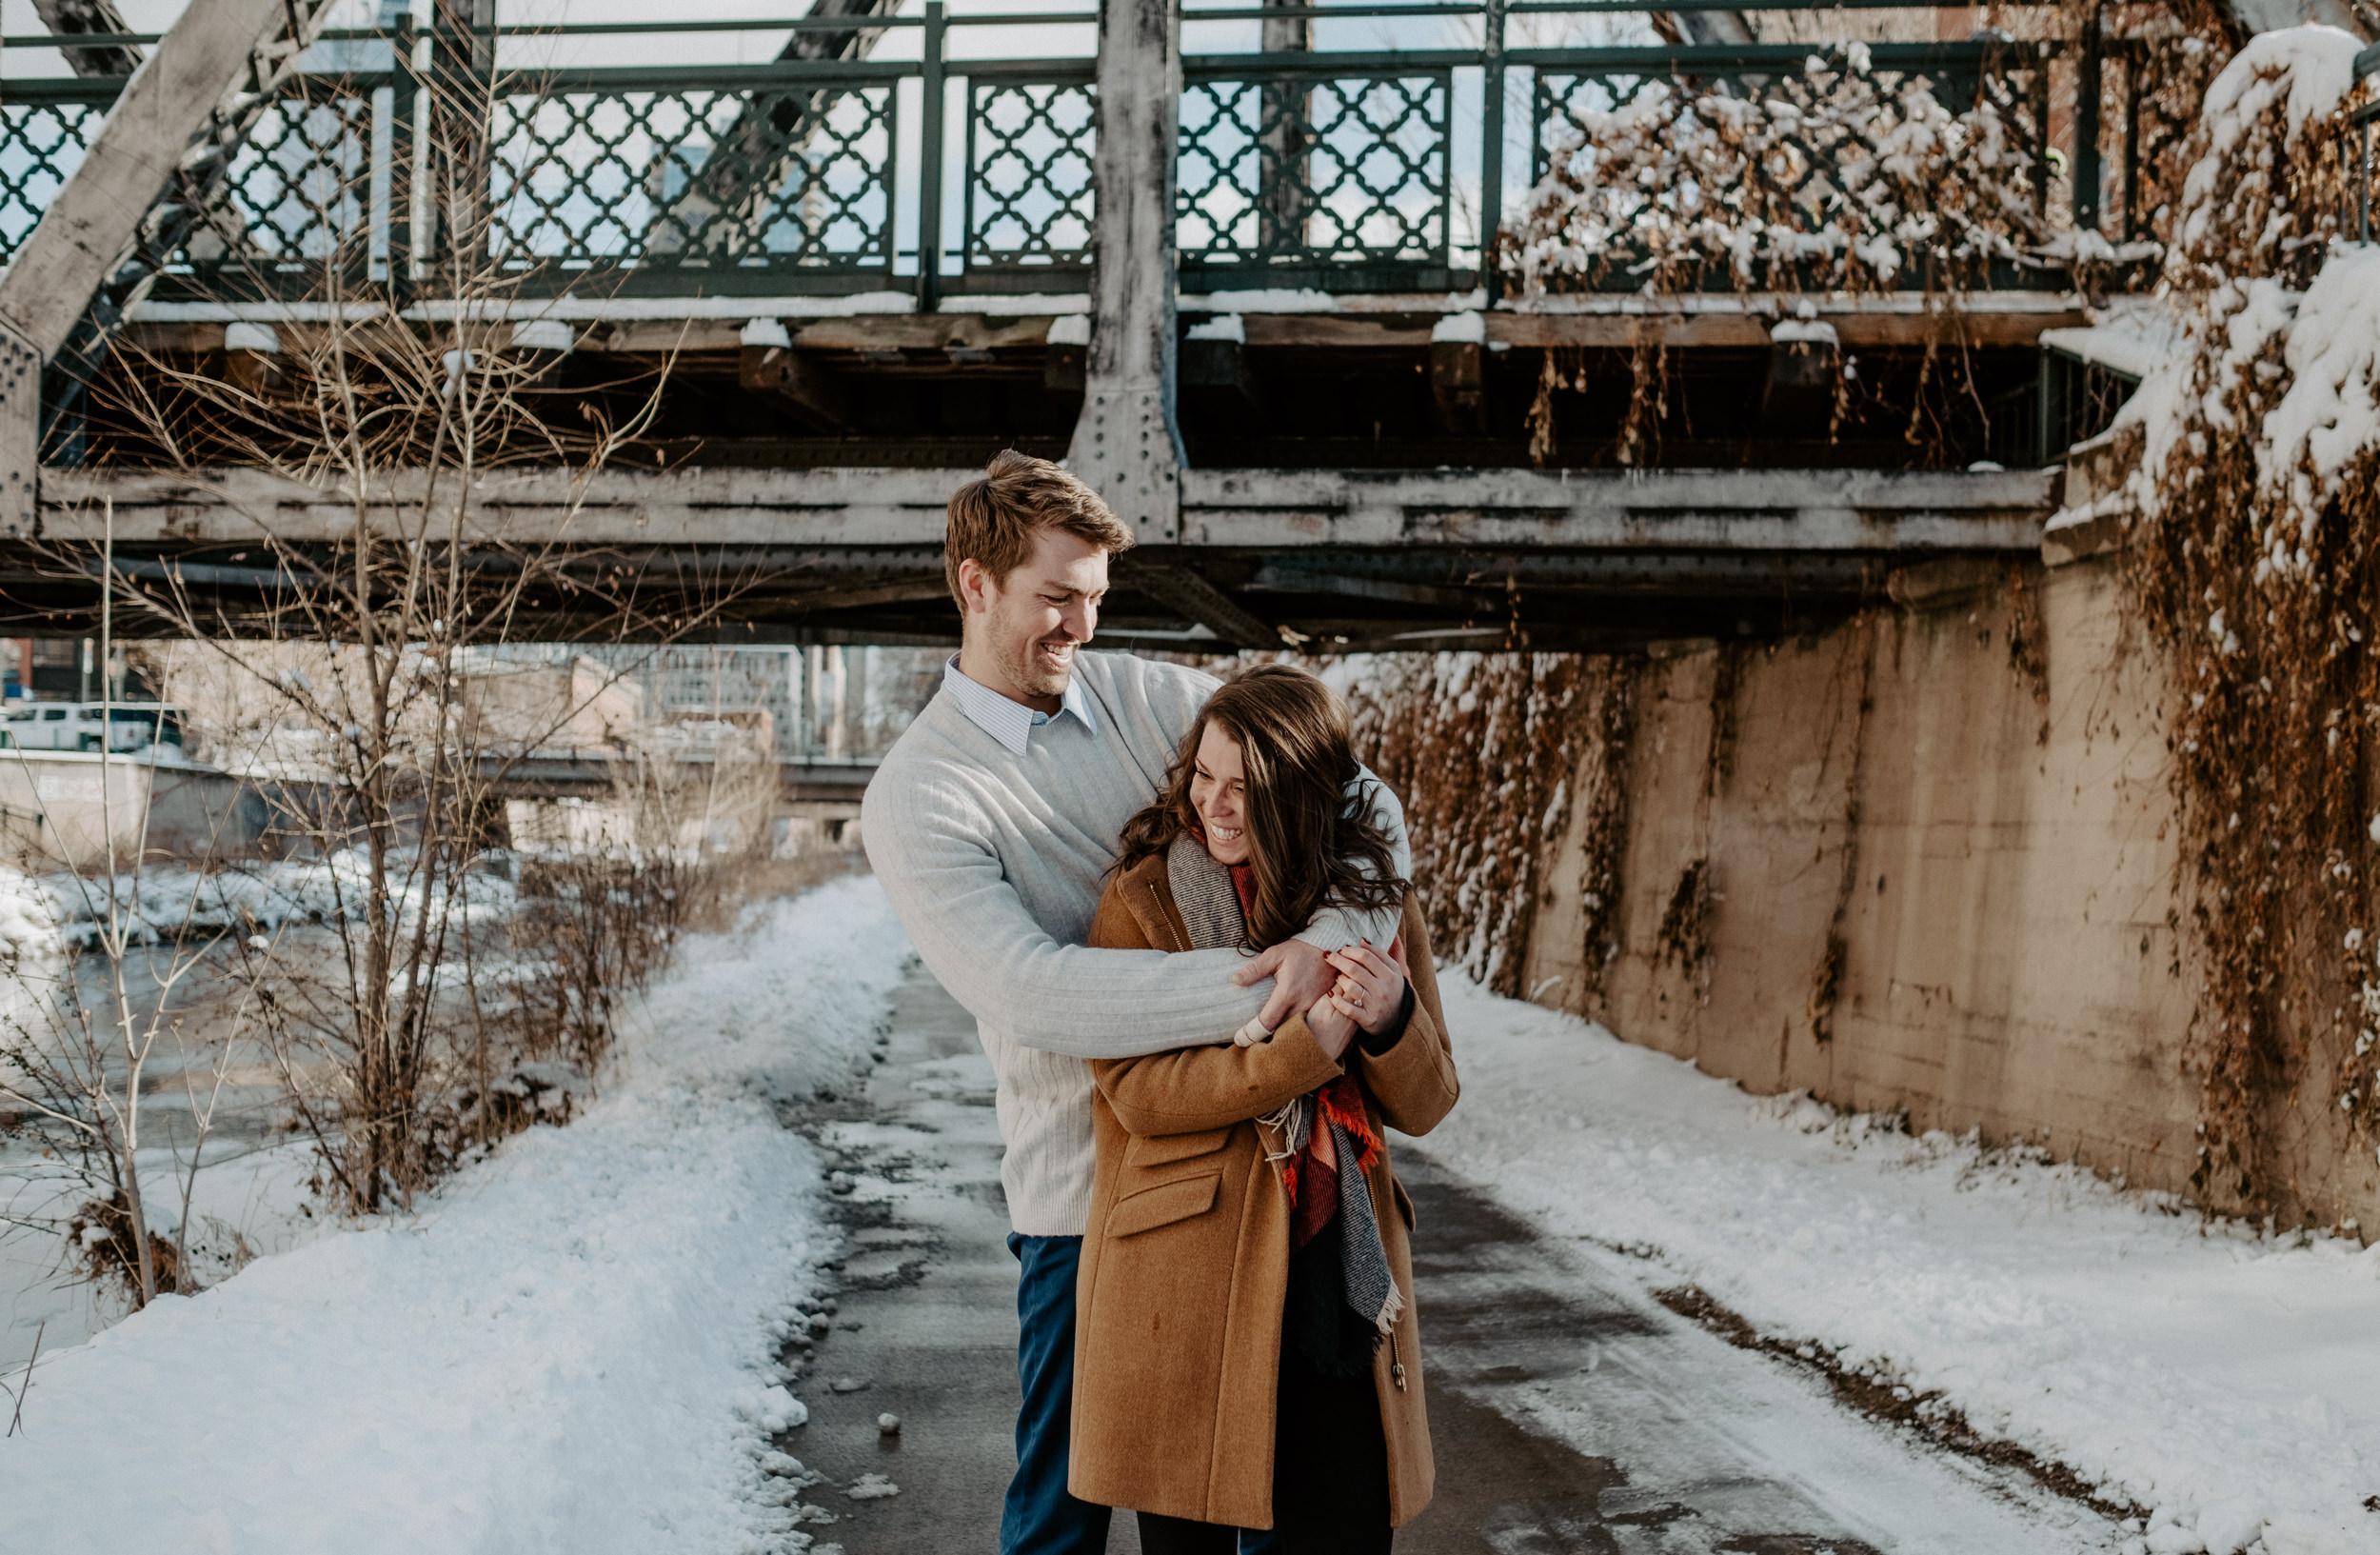 Urban engagement photo inspiration. Downtown Denver engagement session. Colorado wedding and elopement photographer.